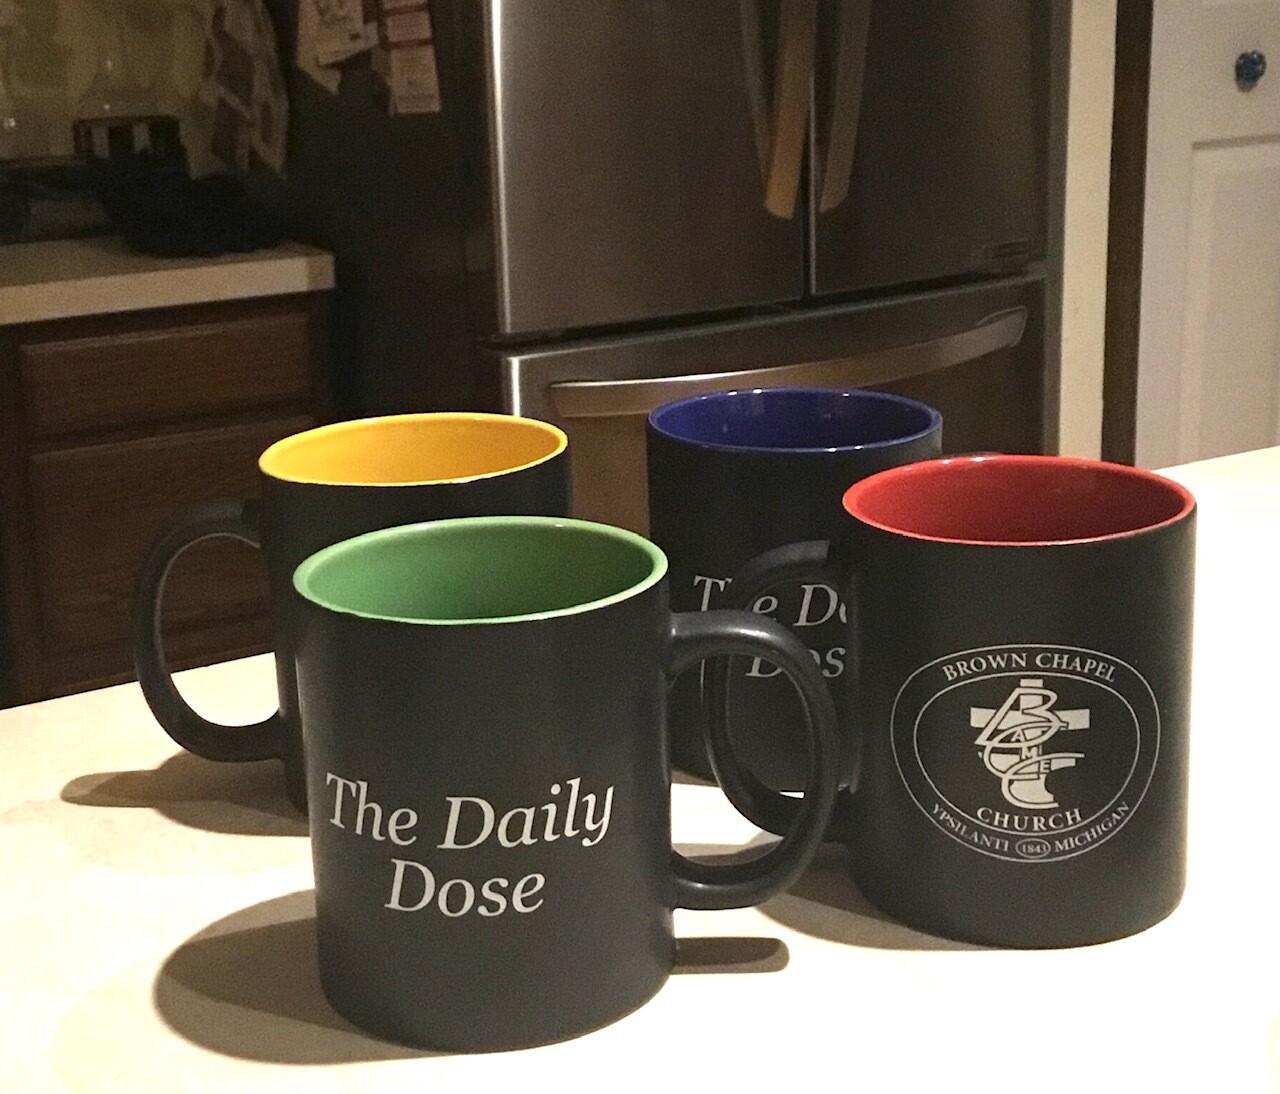 Daily Dose Mugs